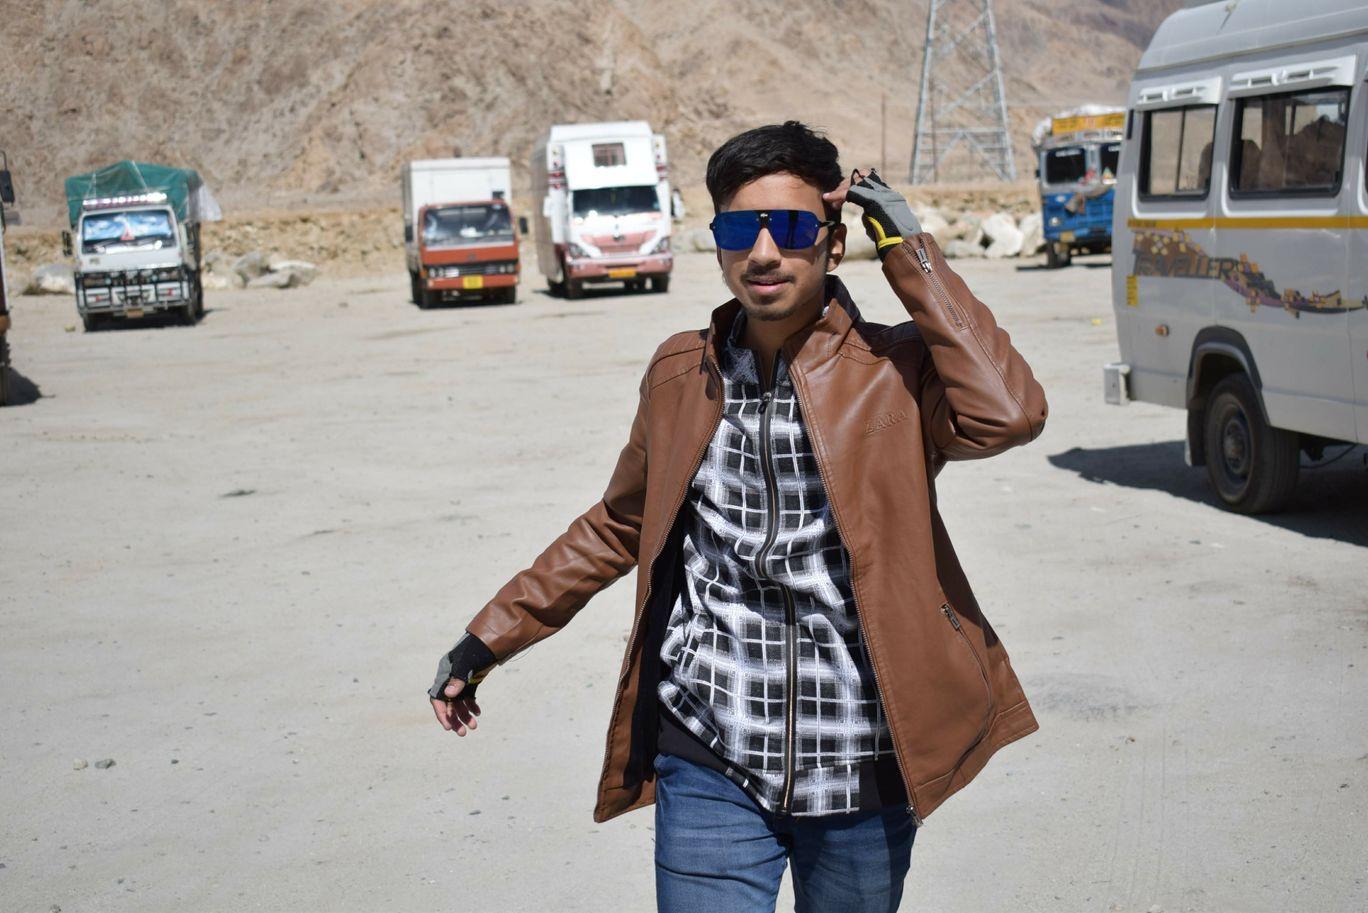 Photo of Ladakh By Aviral Gupta